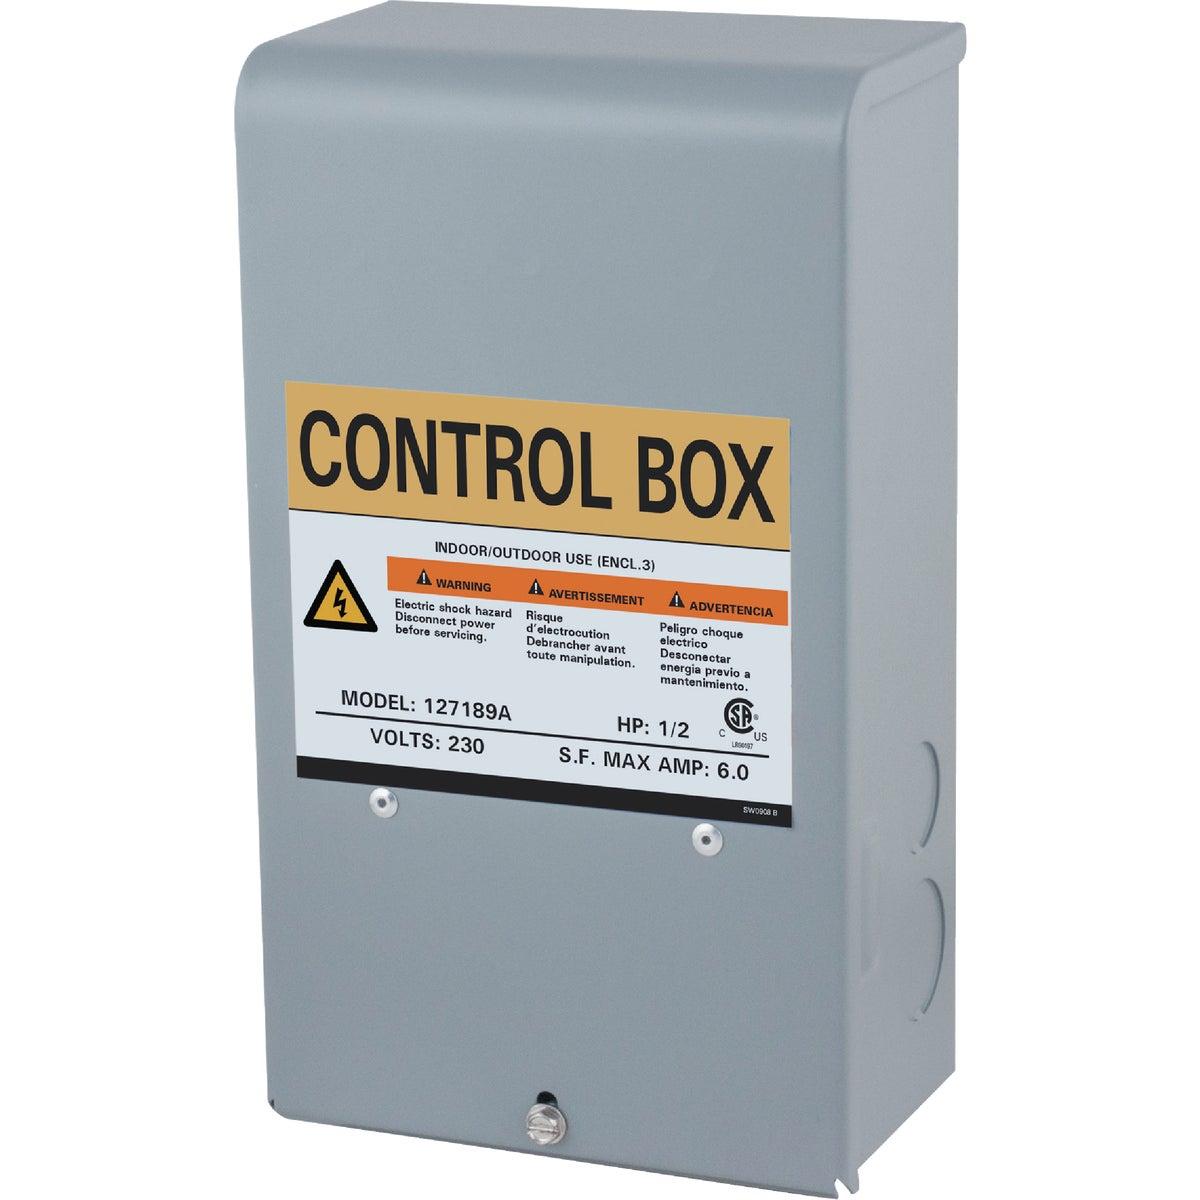 Flint Walling/Star 1/2HP 230V CONTROL 127189